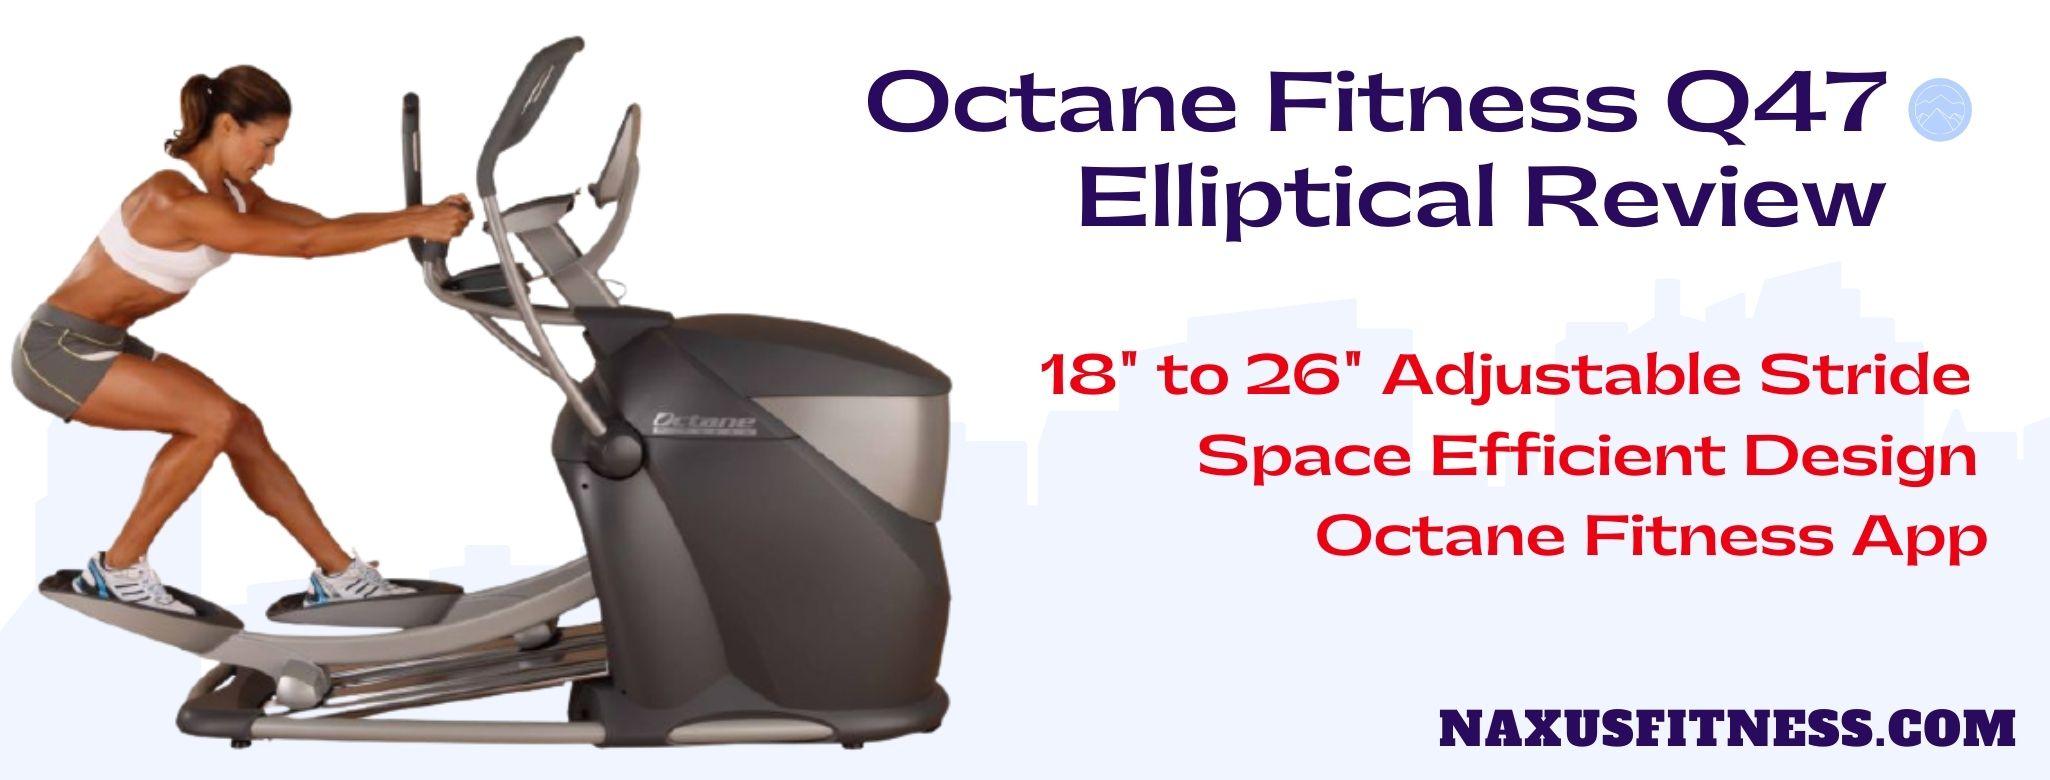 Octane Fitness Q47 Elliptical Review